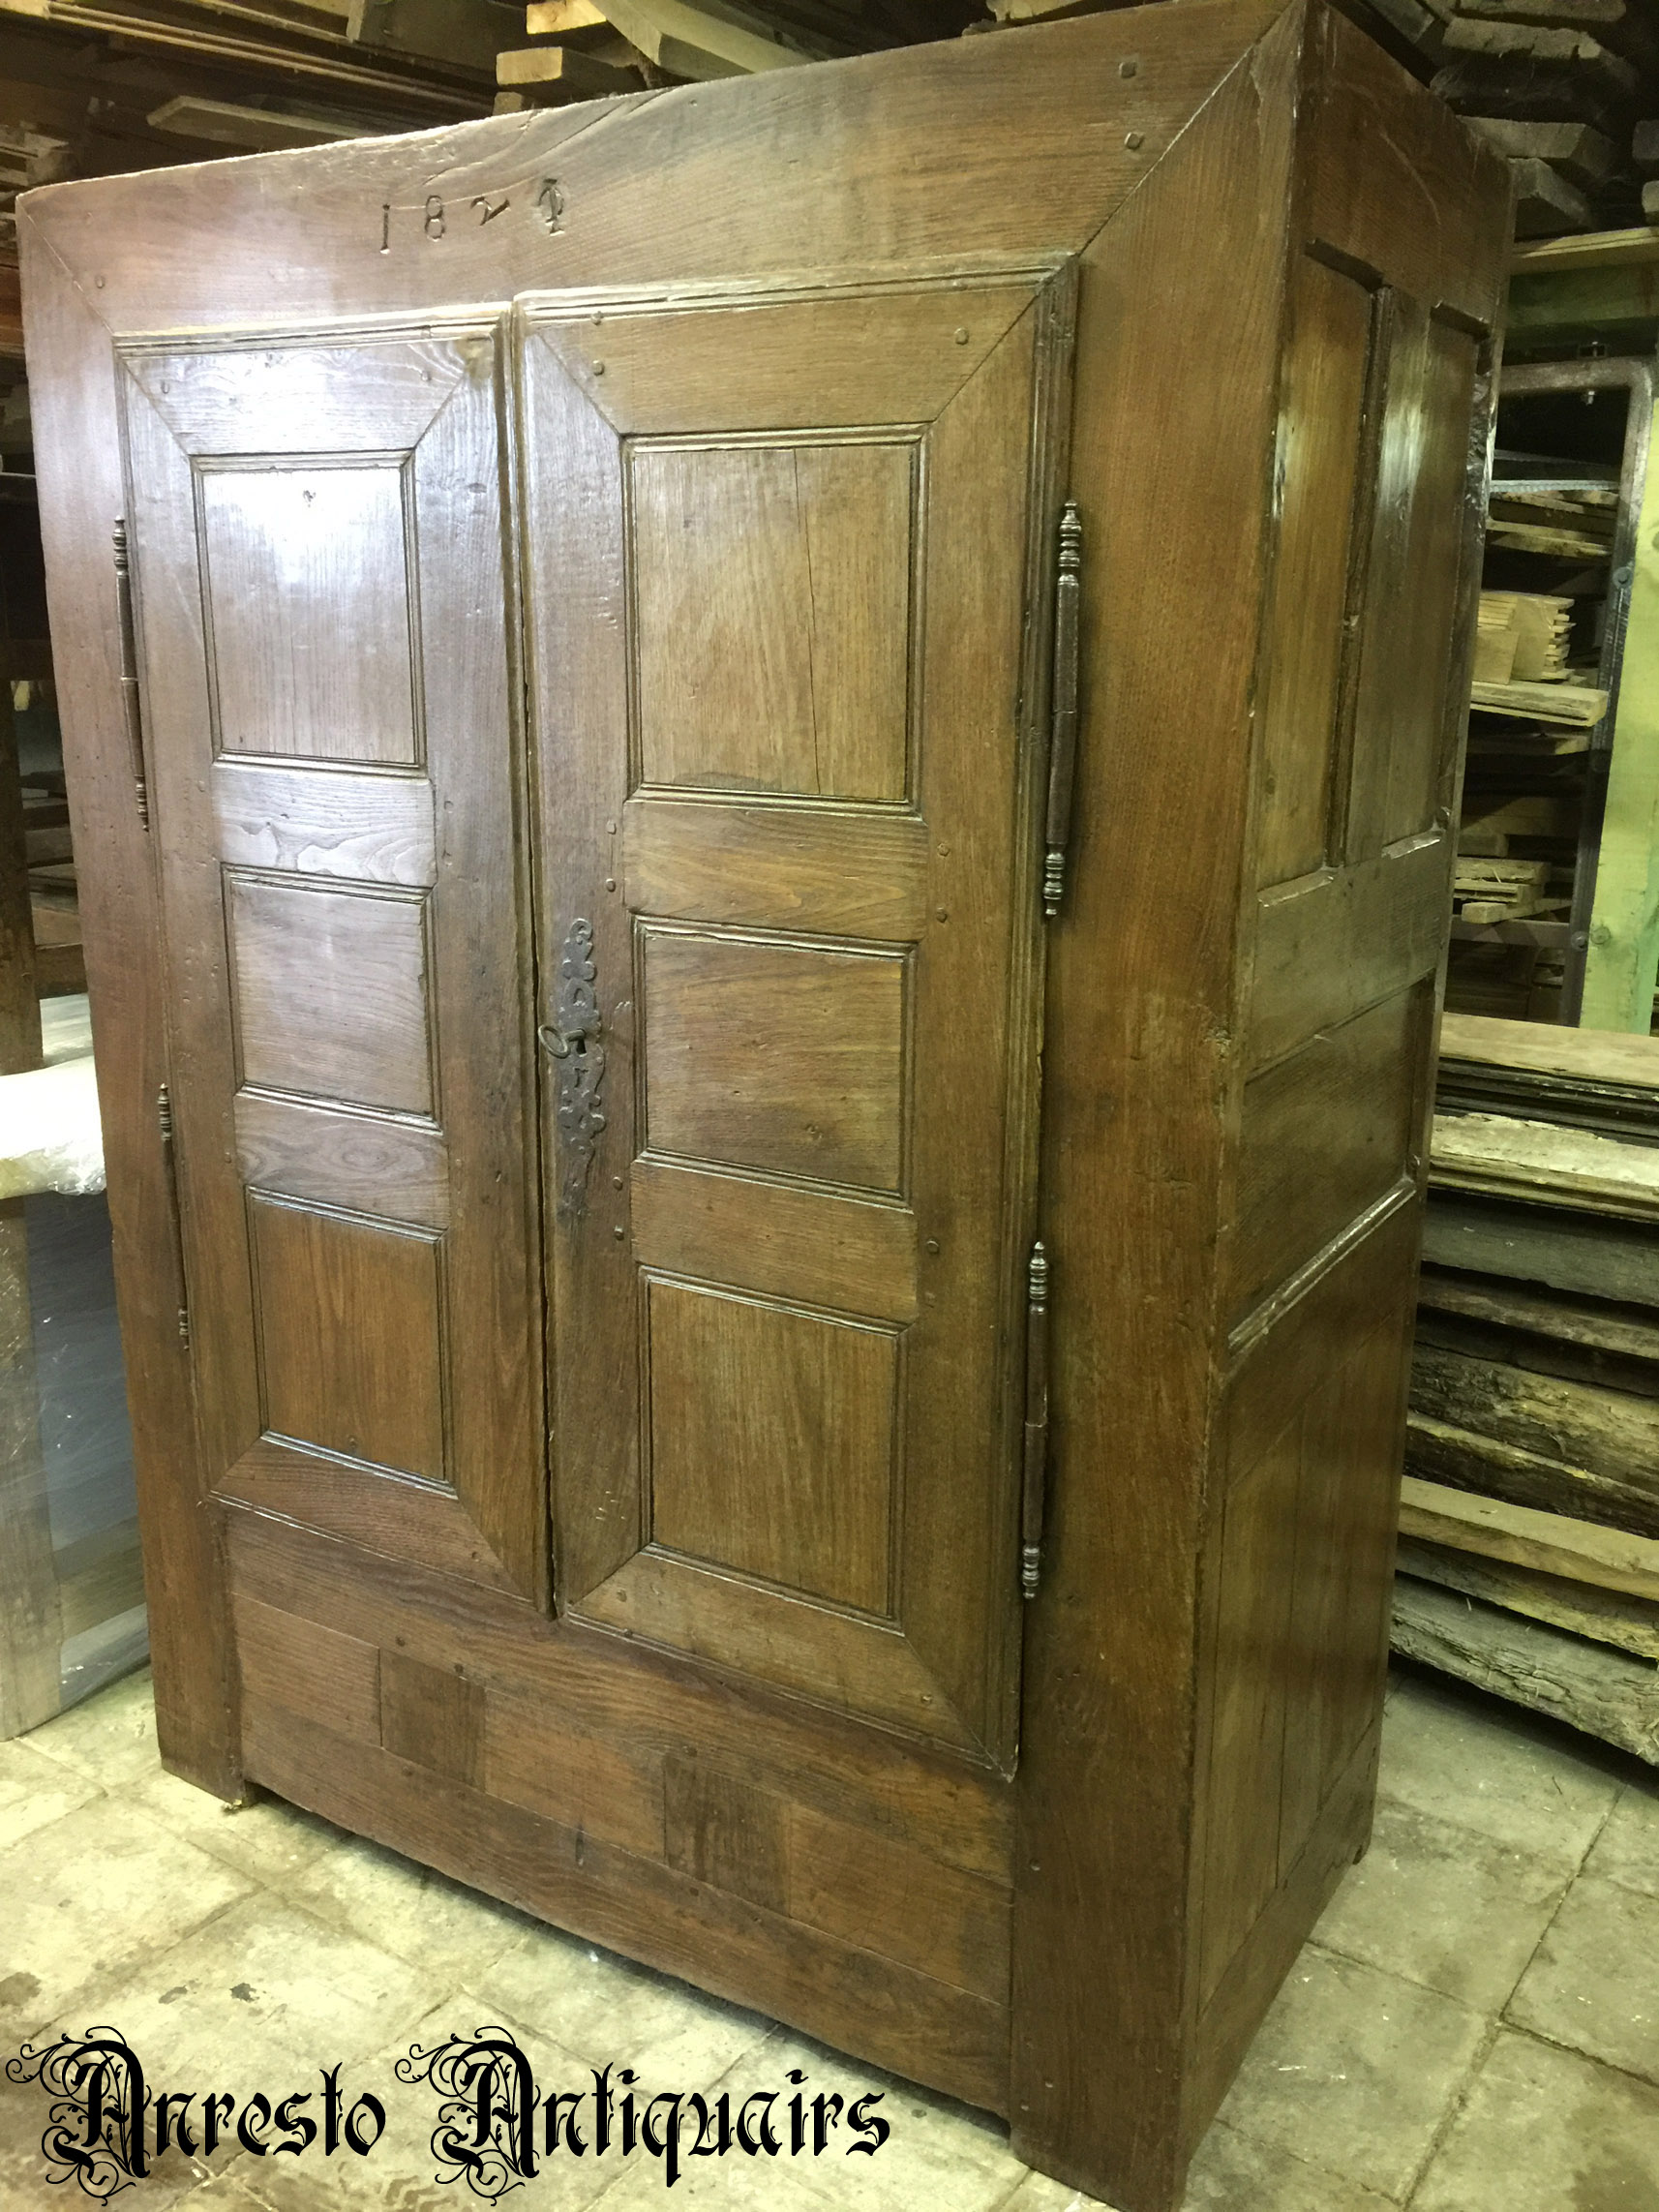 Ref. 45 – Antieke eikenhouten linnenkast, oude houten kleerkast